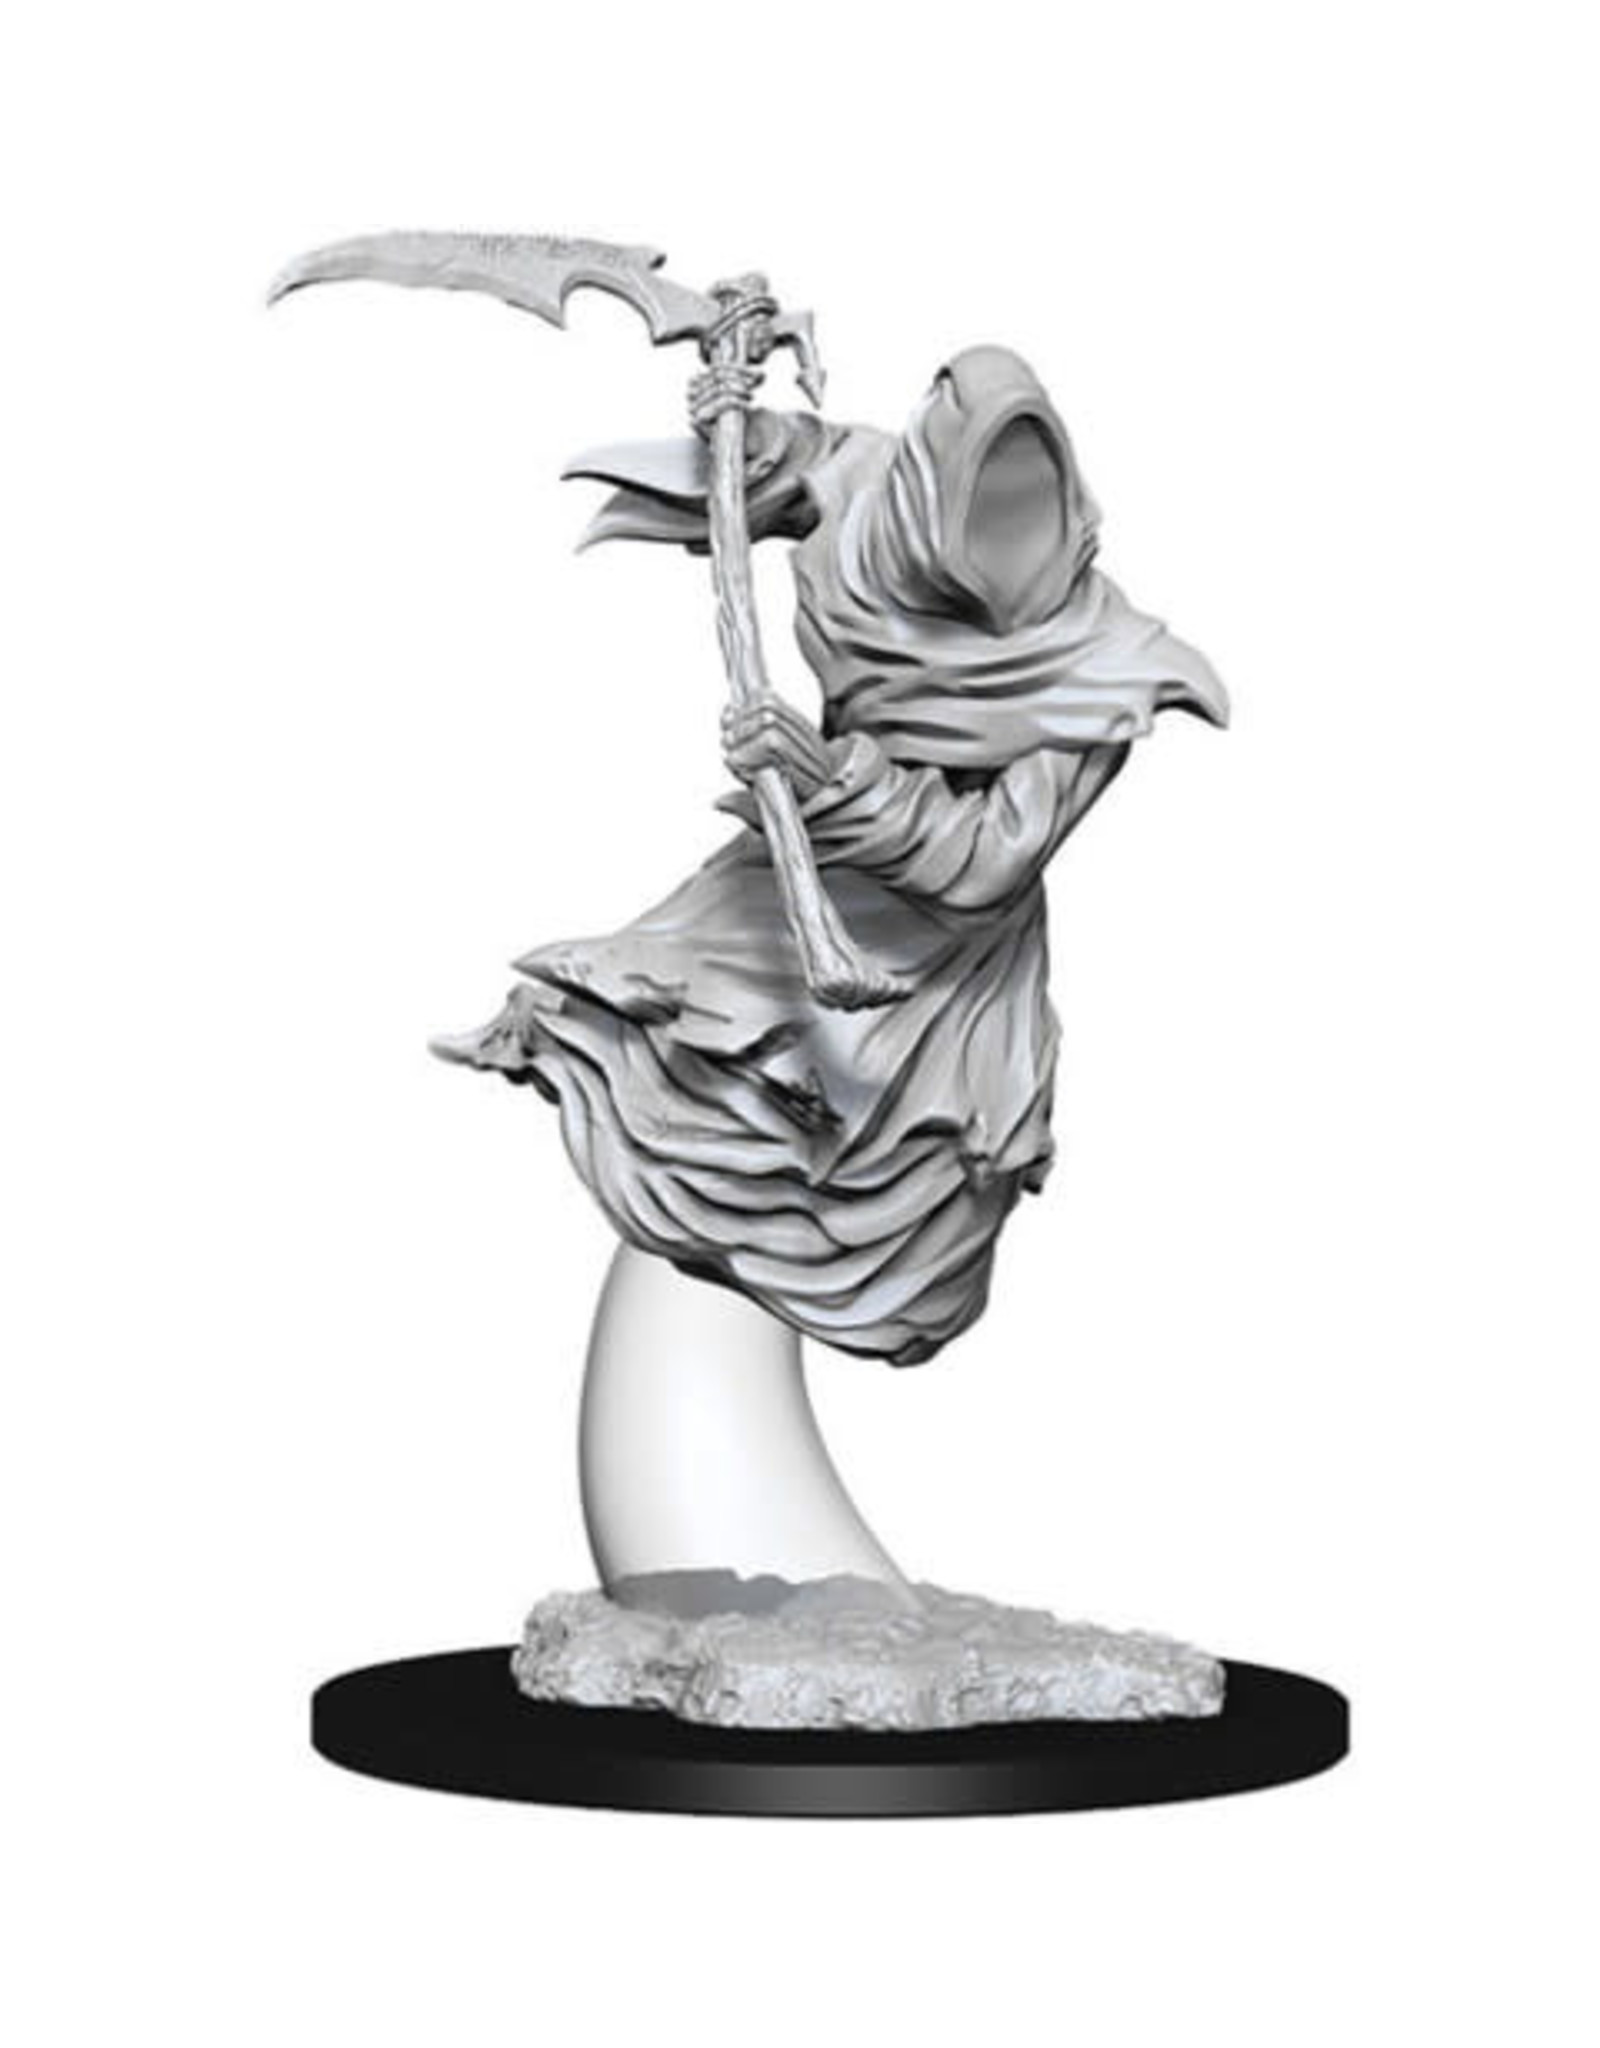 WizKids Pathfinder Minis (unpainted): Grim Reaper Wave 8, 73697